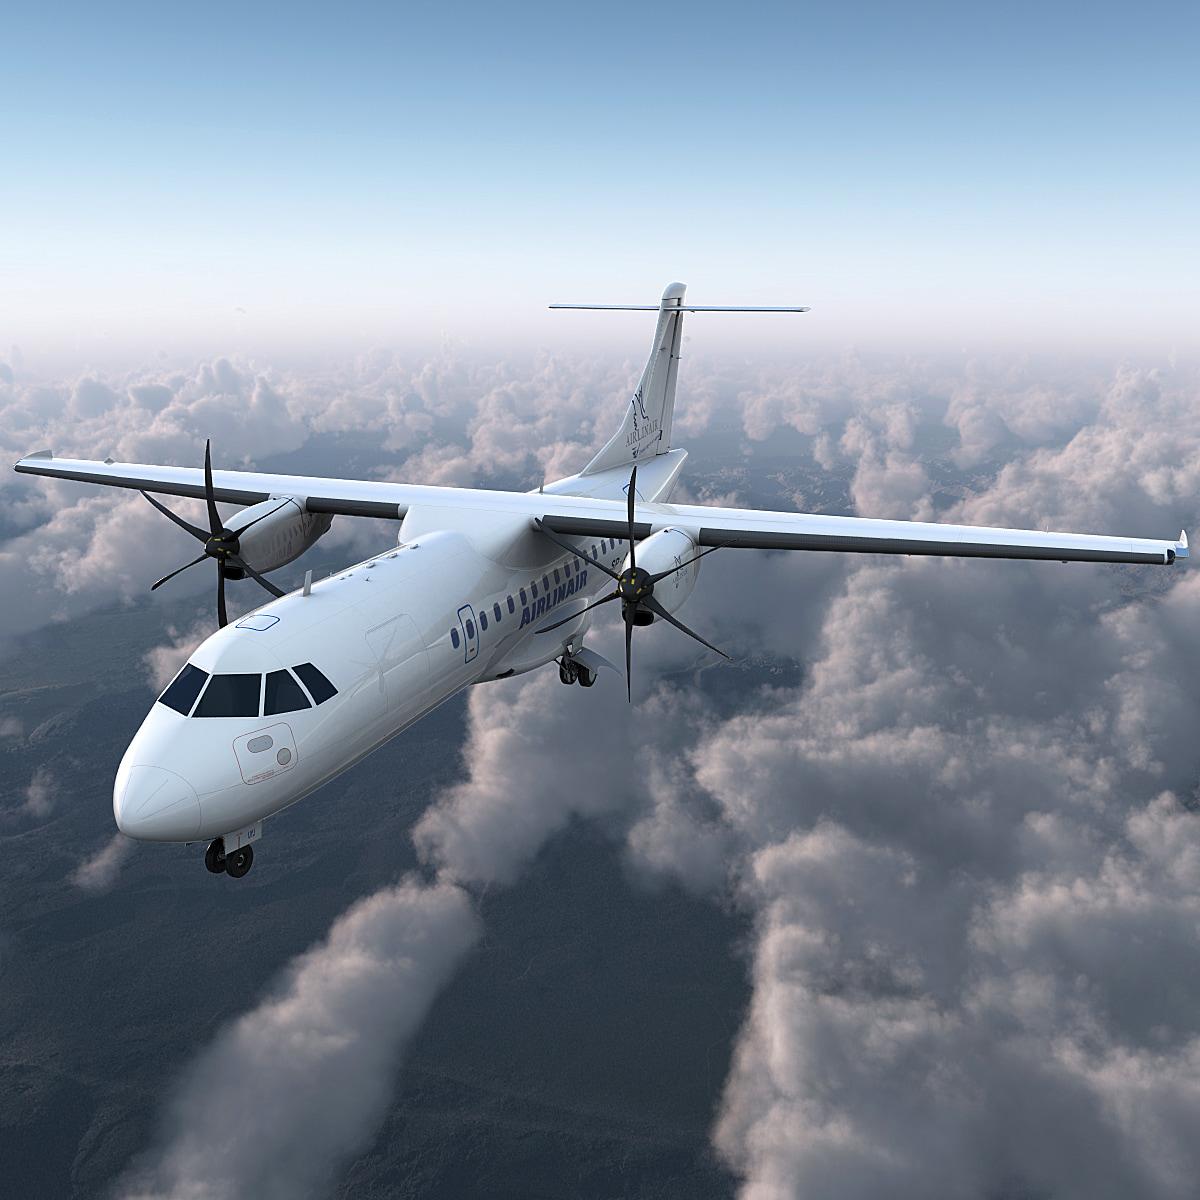 Passenger_Aircraft_ATR_42_Vray_1.jpg